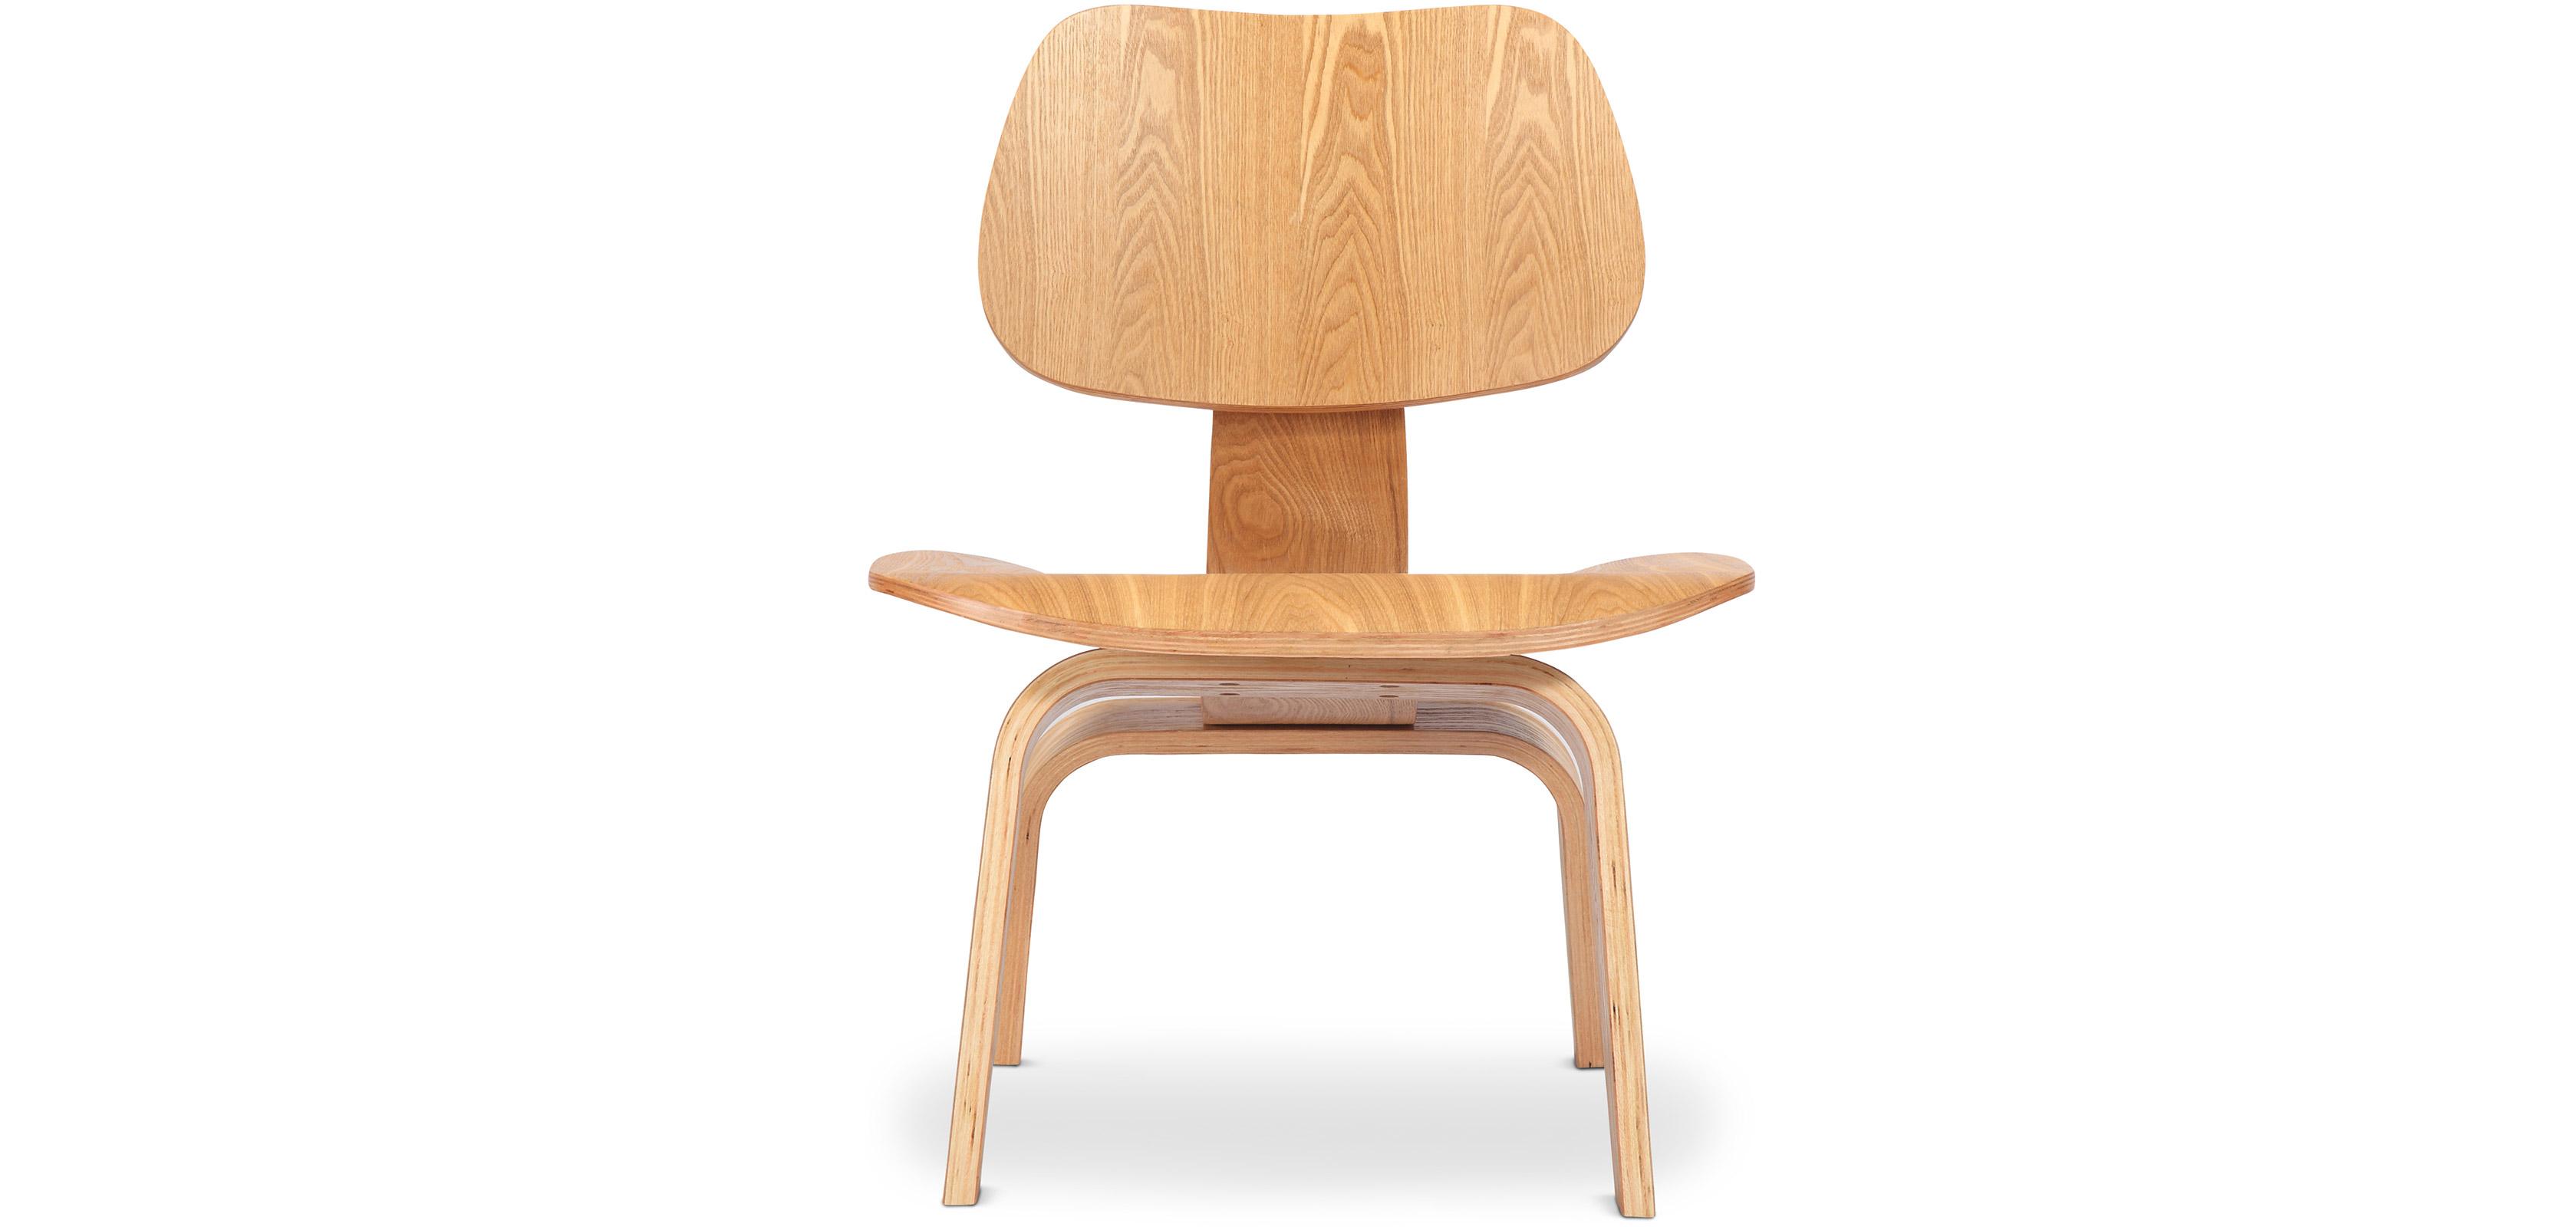 lcw stuhl charles eames style. Black Bedroom Furniture Sets. Home Design Ideas